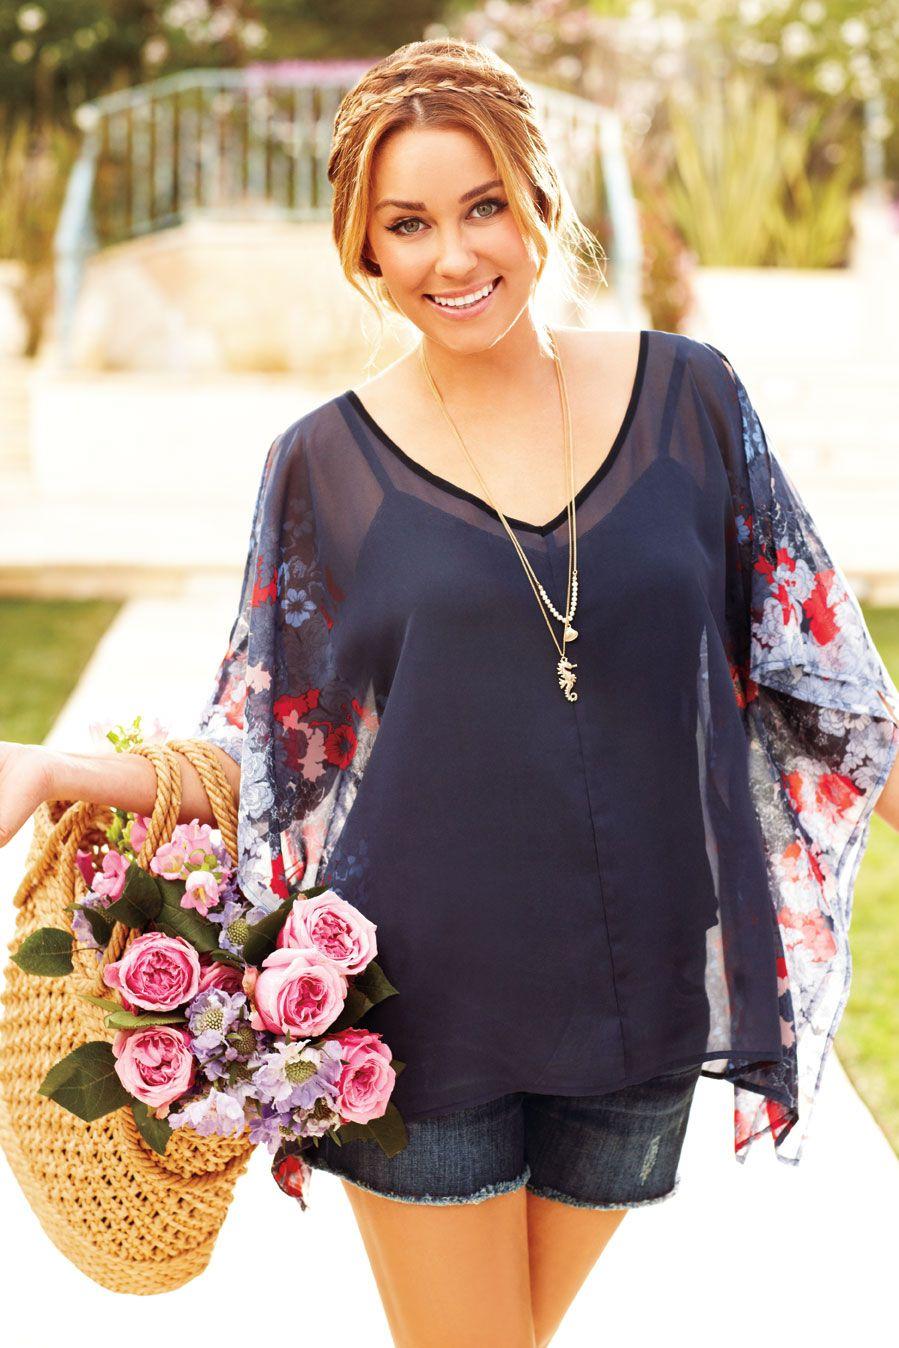 Lauren Conrad. Hair, shirt, and necklace= wonderful